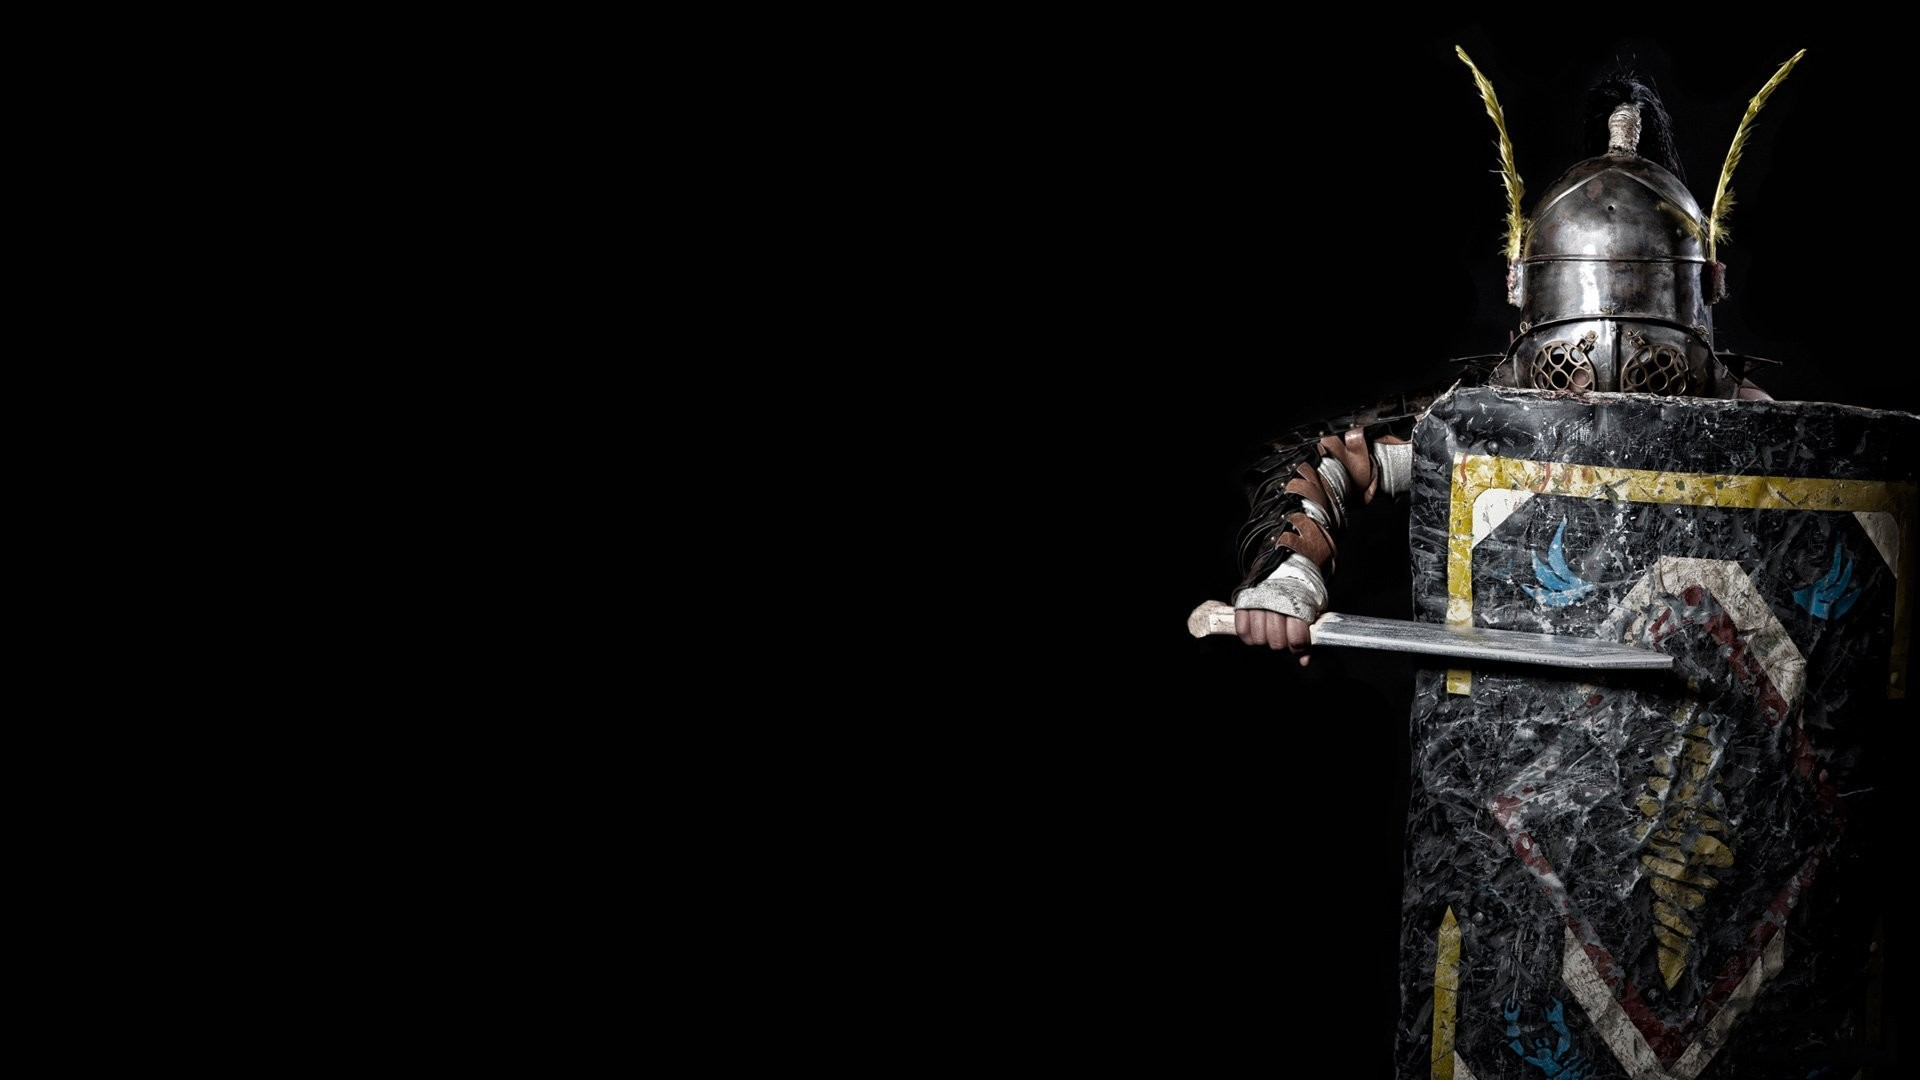 provocator provocateur gladiator armour helmet shield